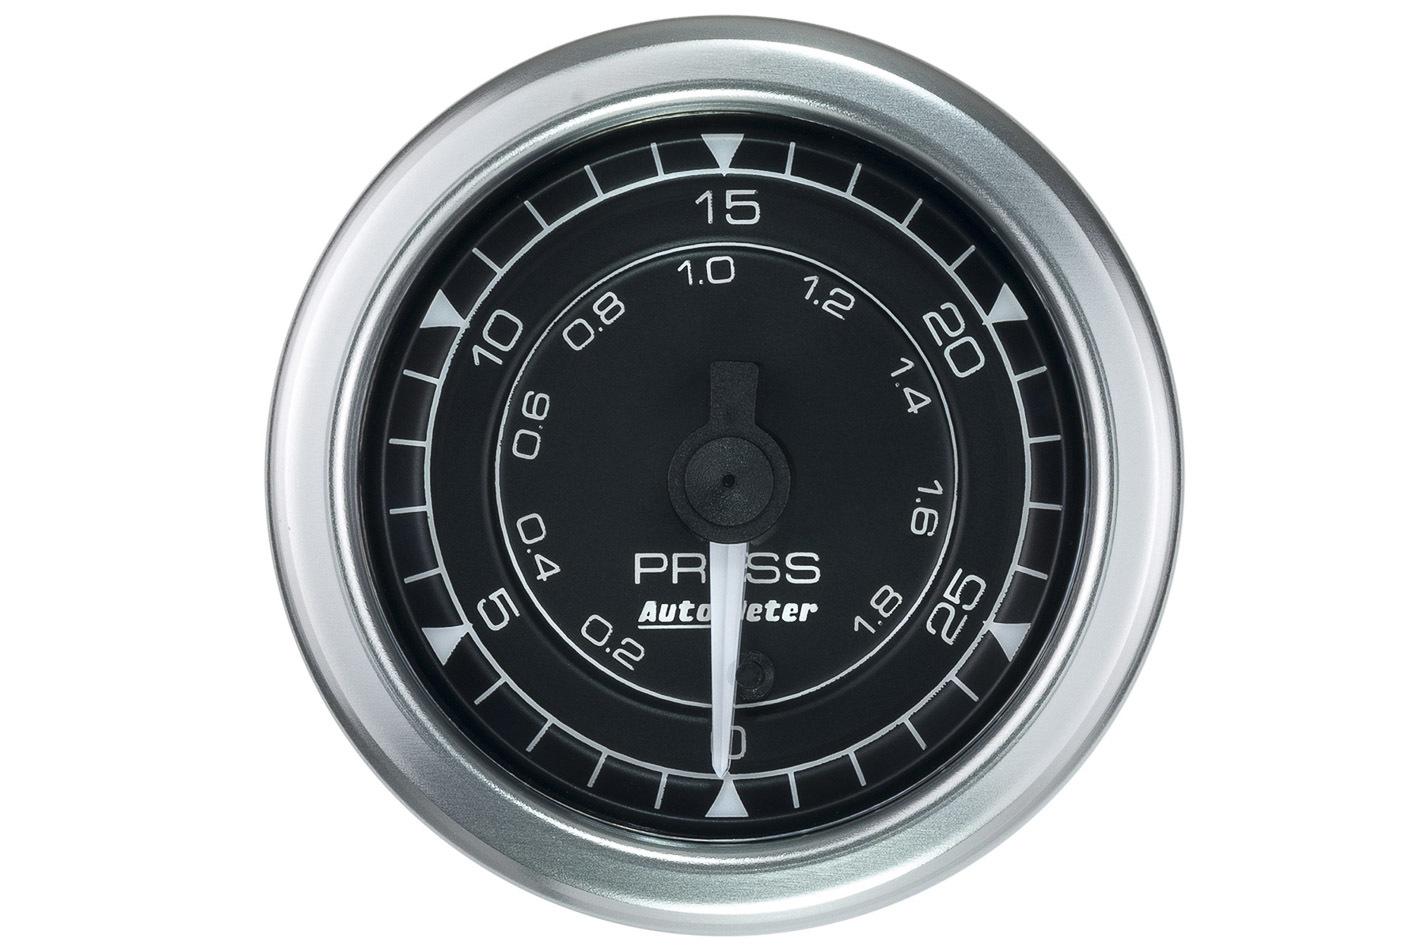 Auto Meter 8164 Pressure Gauge, Chrono Series, 0-30 psi, Electric, Analog, Full Sweep, 2-1/16 in Diameter, Fittings / Harness / Hardware / Sender Included, Black Face, Universal, Each